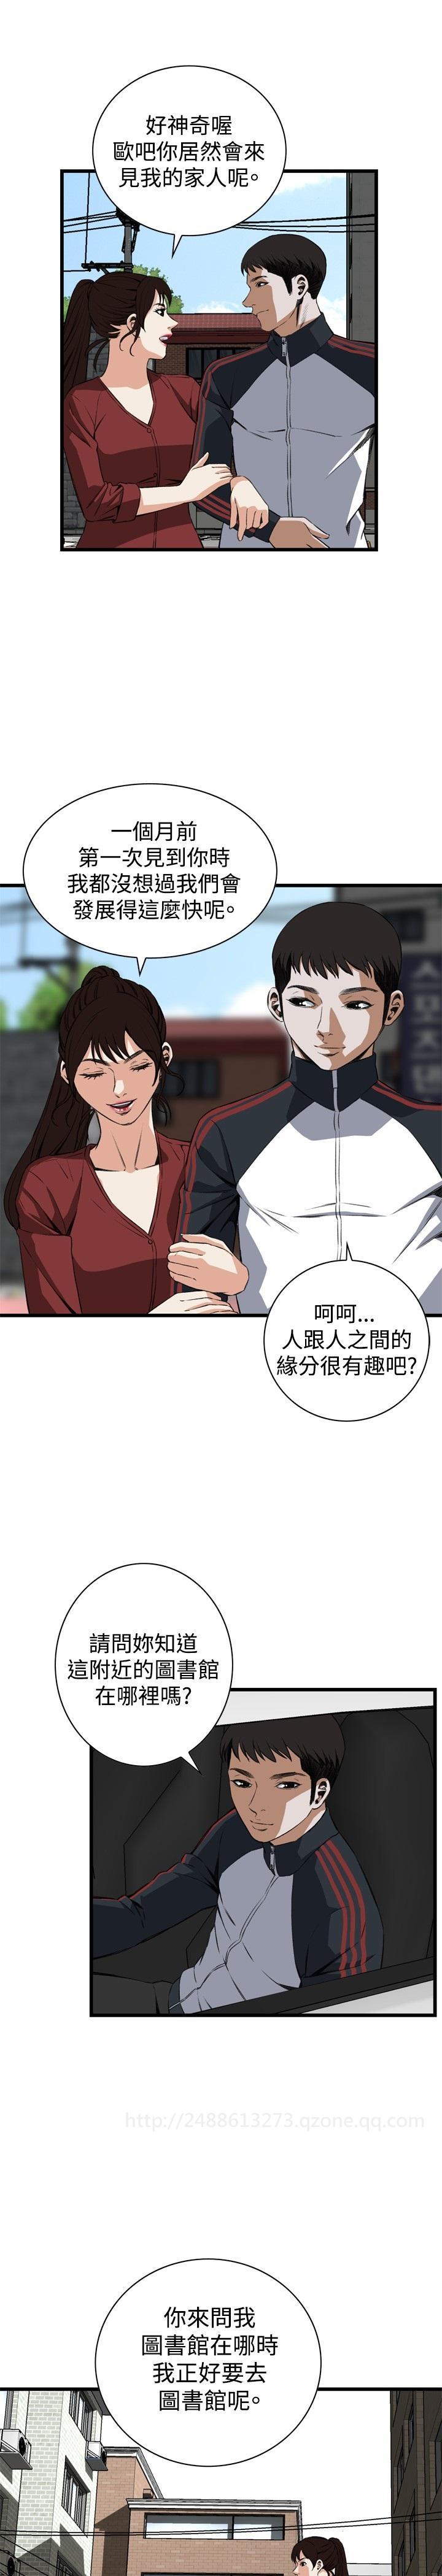 Take a Peek 偷窥 Ch.39~60 [Chinese]中文 607